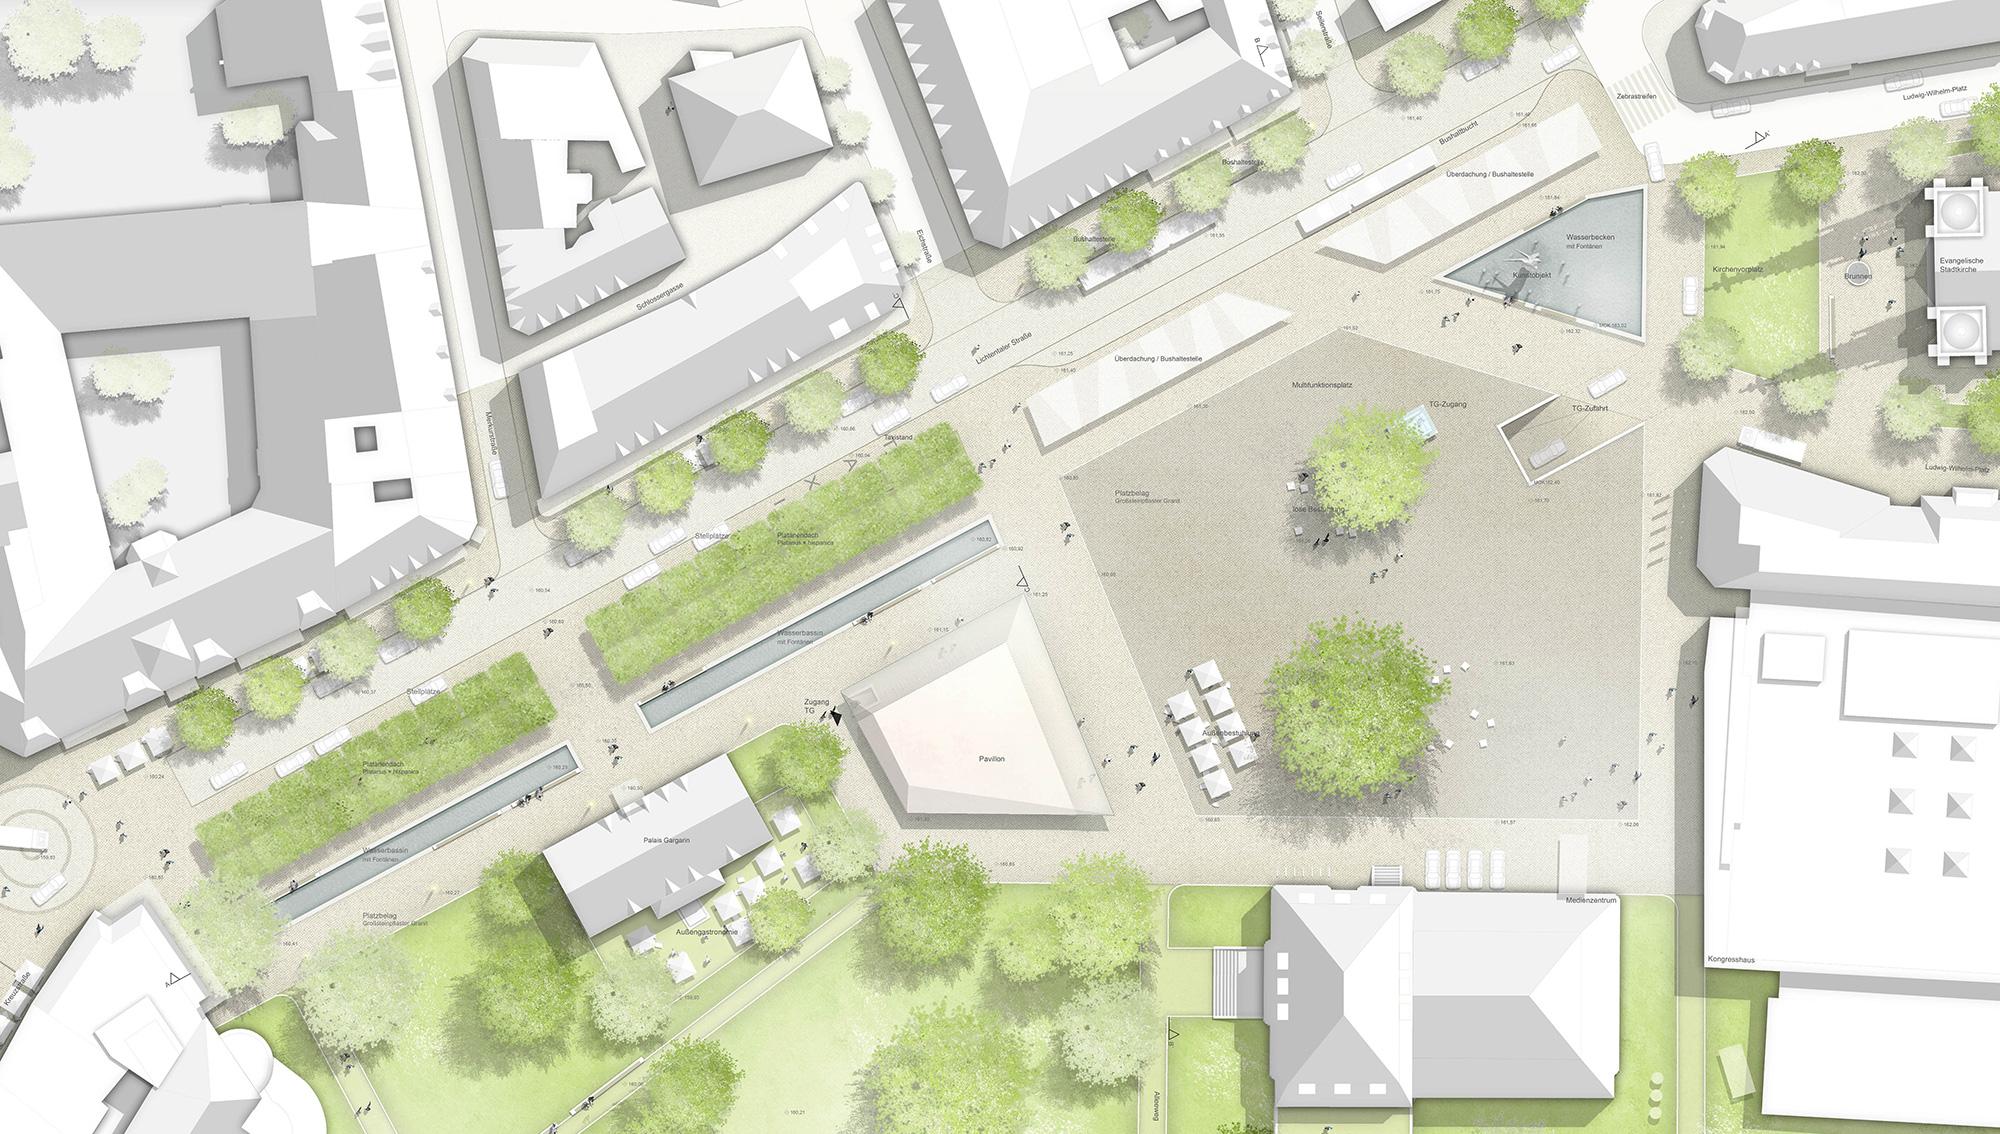 rmp stephan lenzen landschaftsarchitekten nachhaltige stadtlandschaften. Black Bedroom Furniture Sets. Home Design Ideas